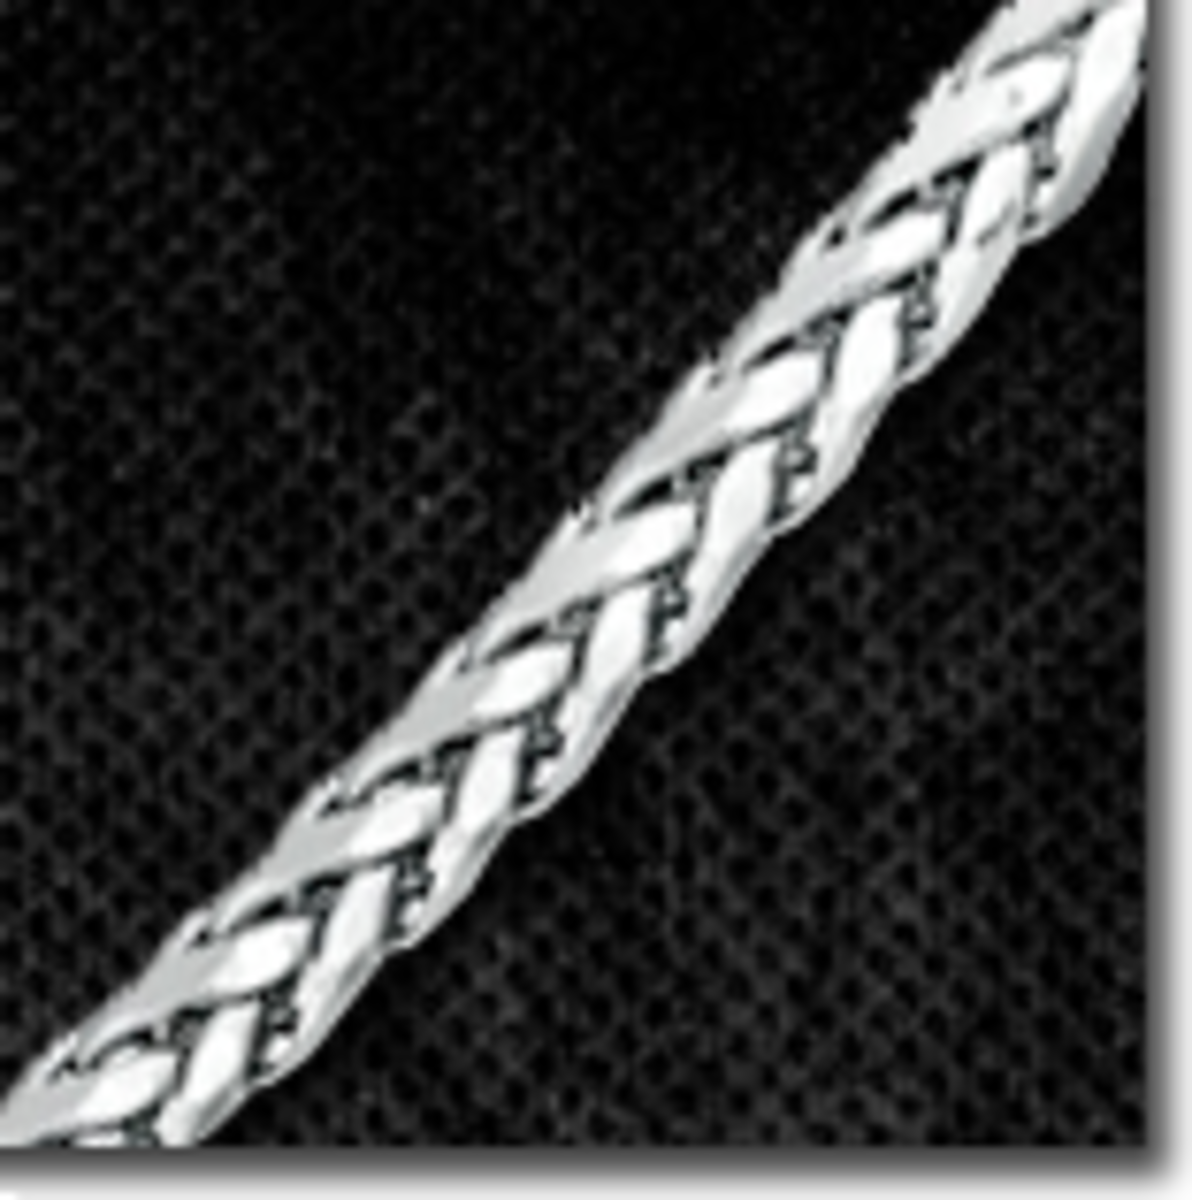 ▲ Wheat Link Chain